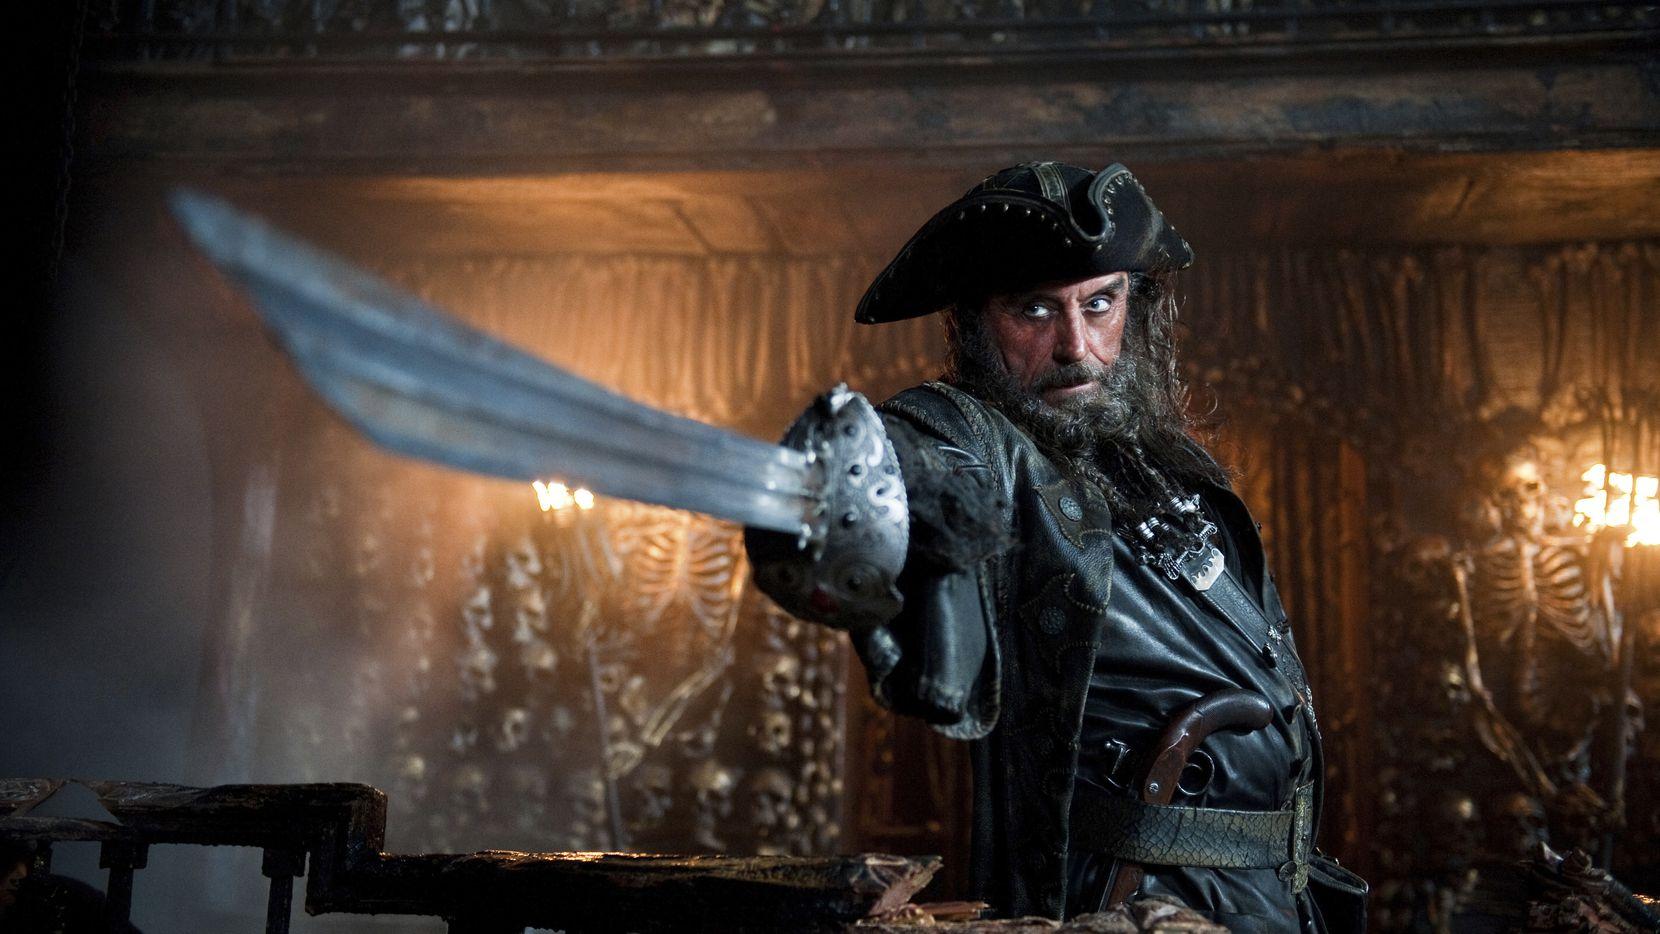 Ian McShane as Blackbeard in Pirates of the Caribbean: On Stranger Tides